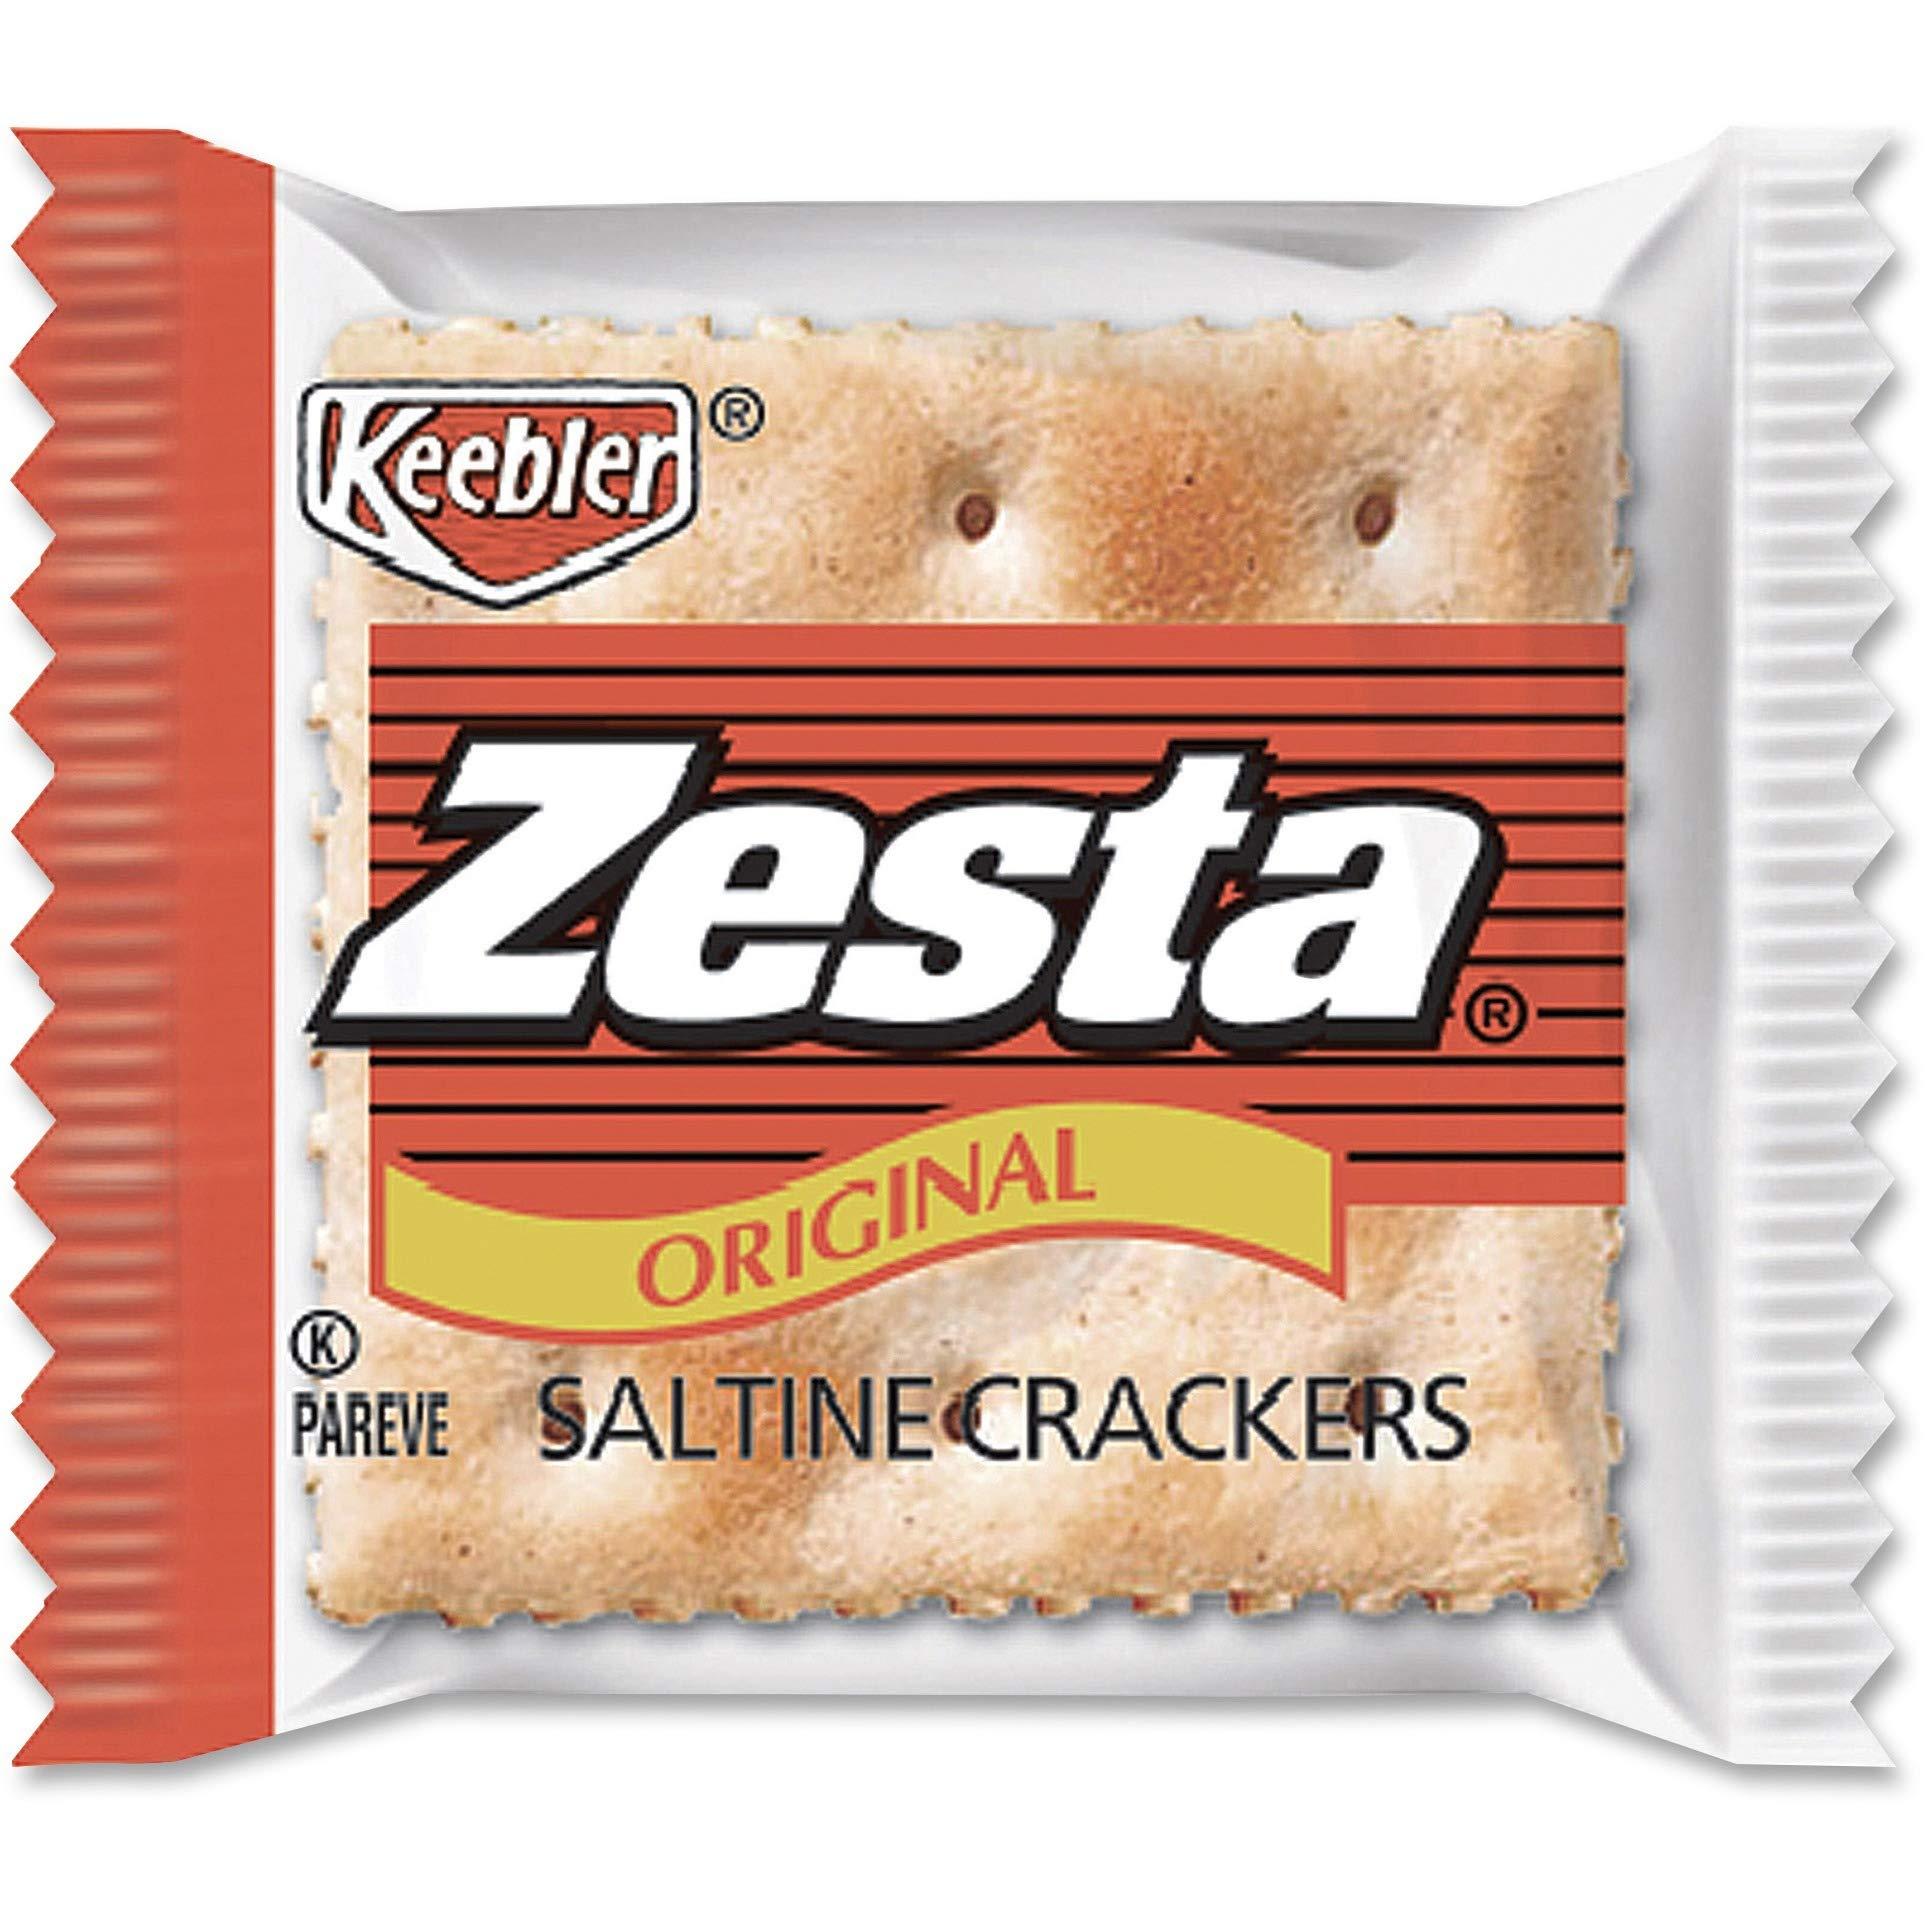 Cracker Keebler Zesta Saltine 500 Case 8 Count by Kellogg's